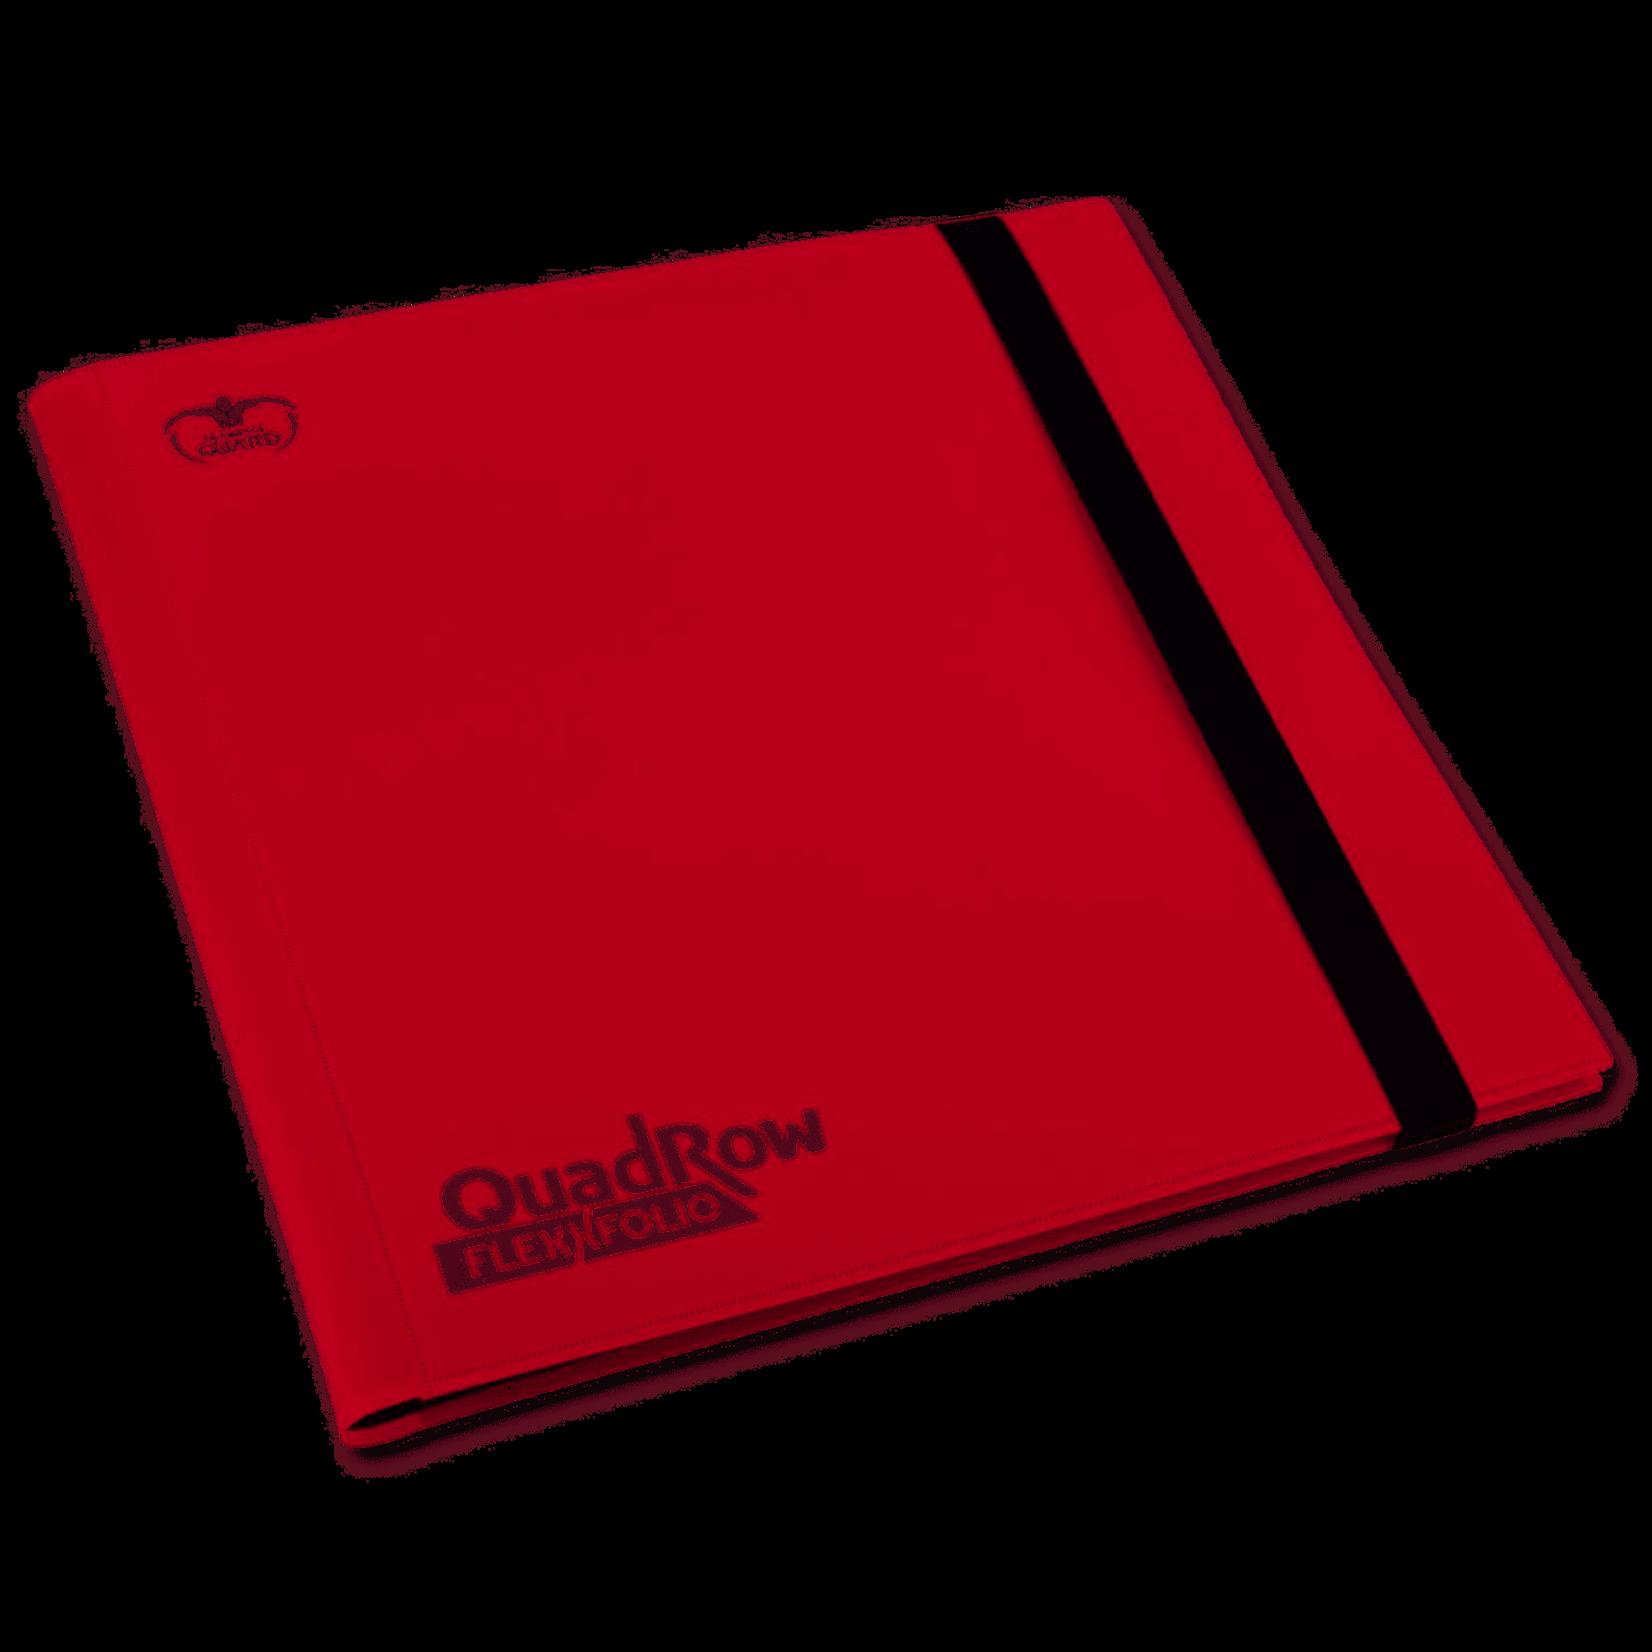 Quadrow Flexxfolio Red